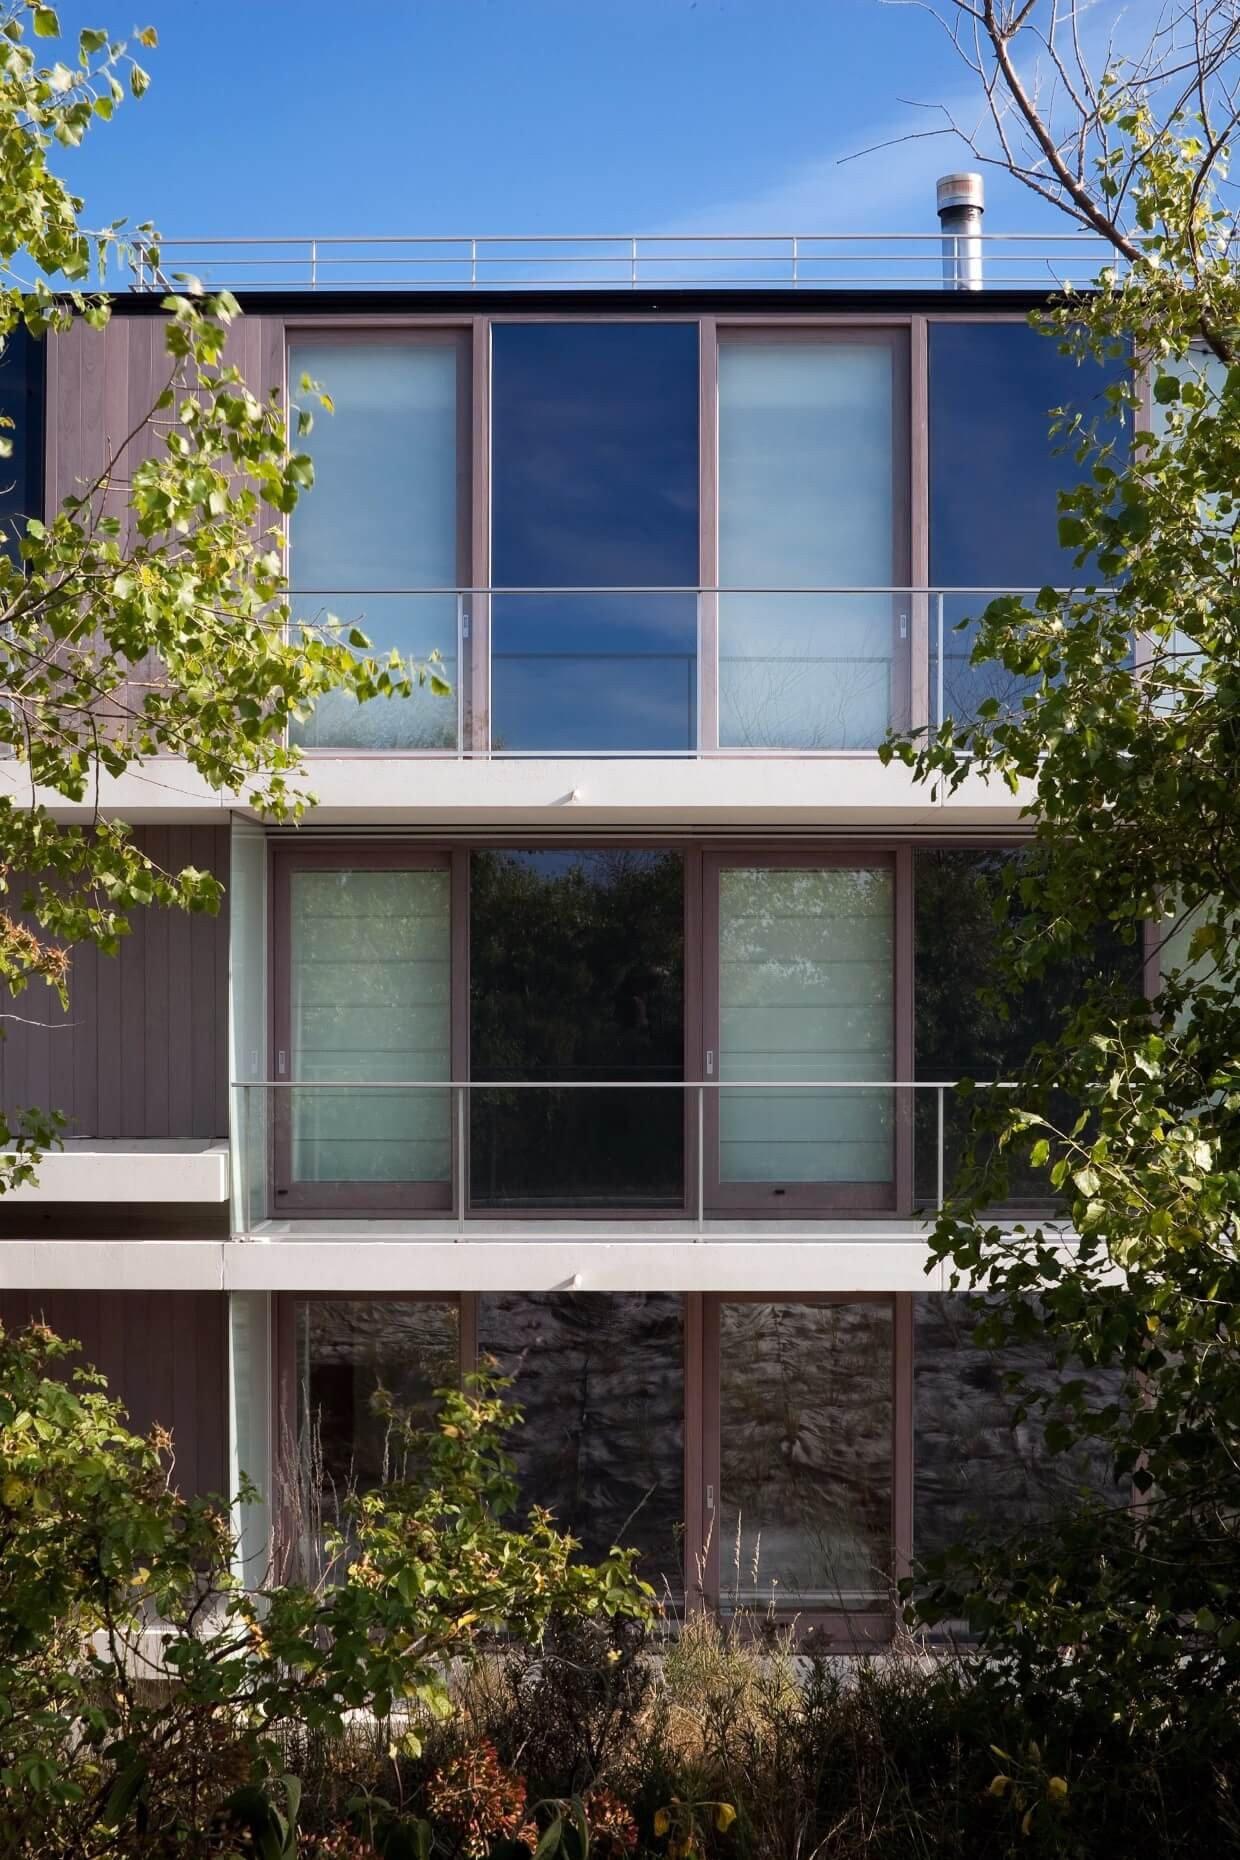 Rietveldprojects-Periscoop-appartement-design-architectuur-kust22